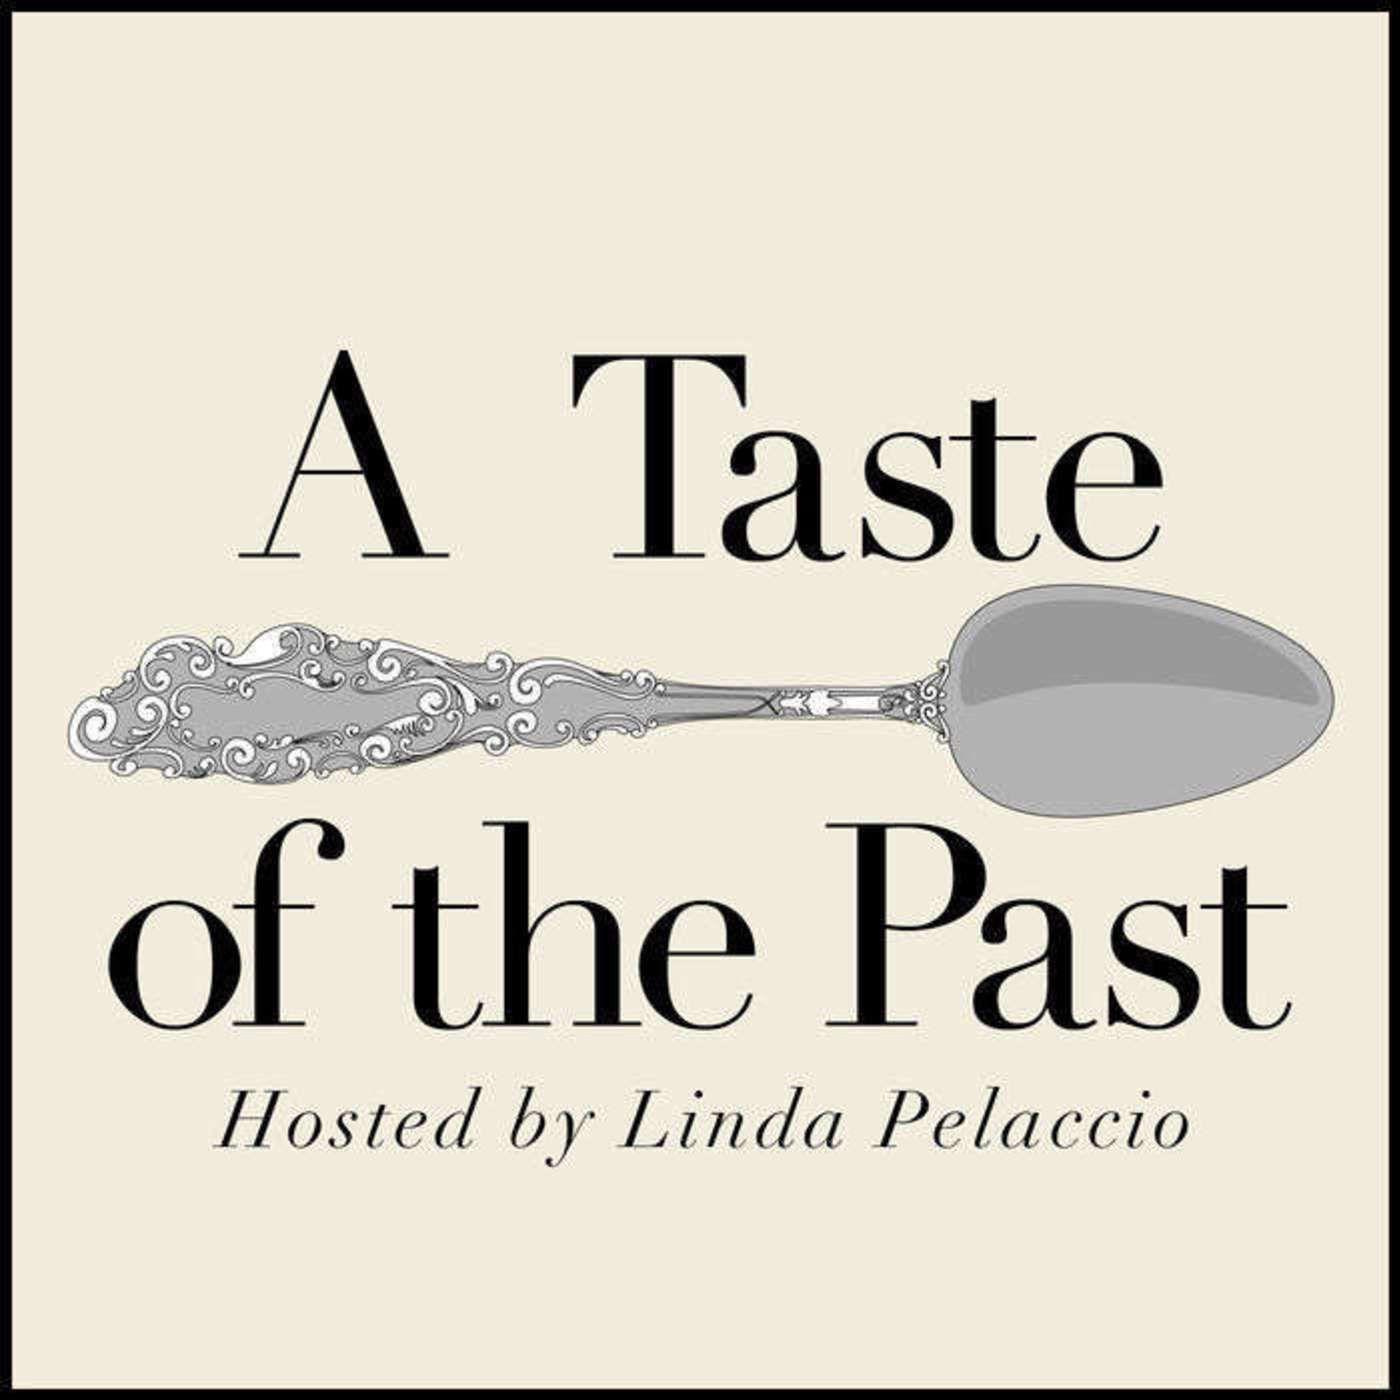 Episode 183: Colonial Drinks: Shrubs, Flips, & Rattle